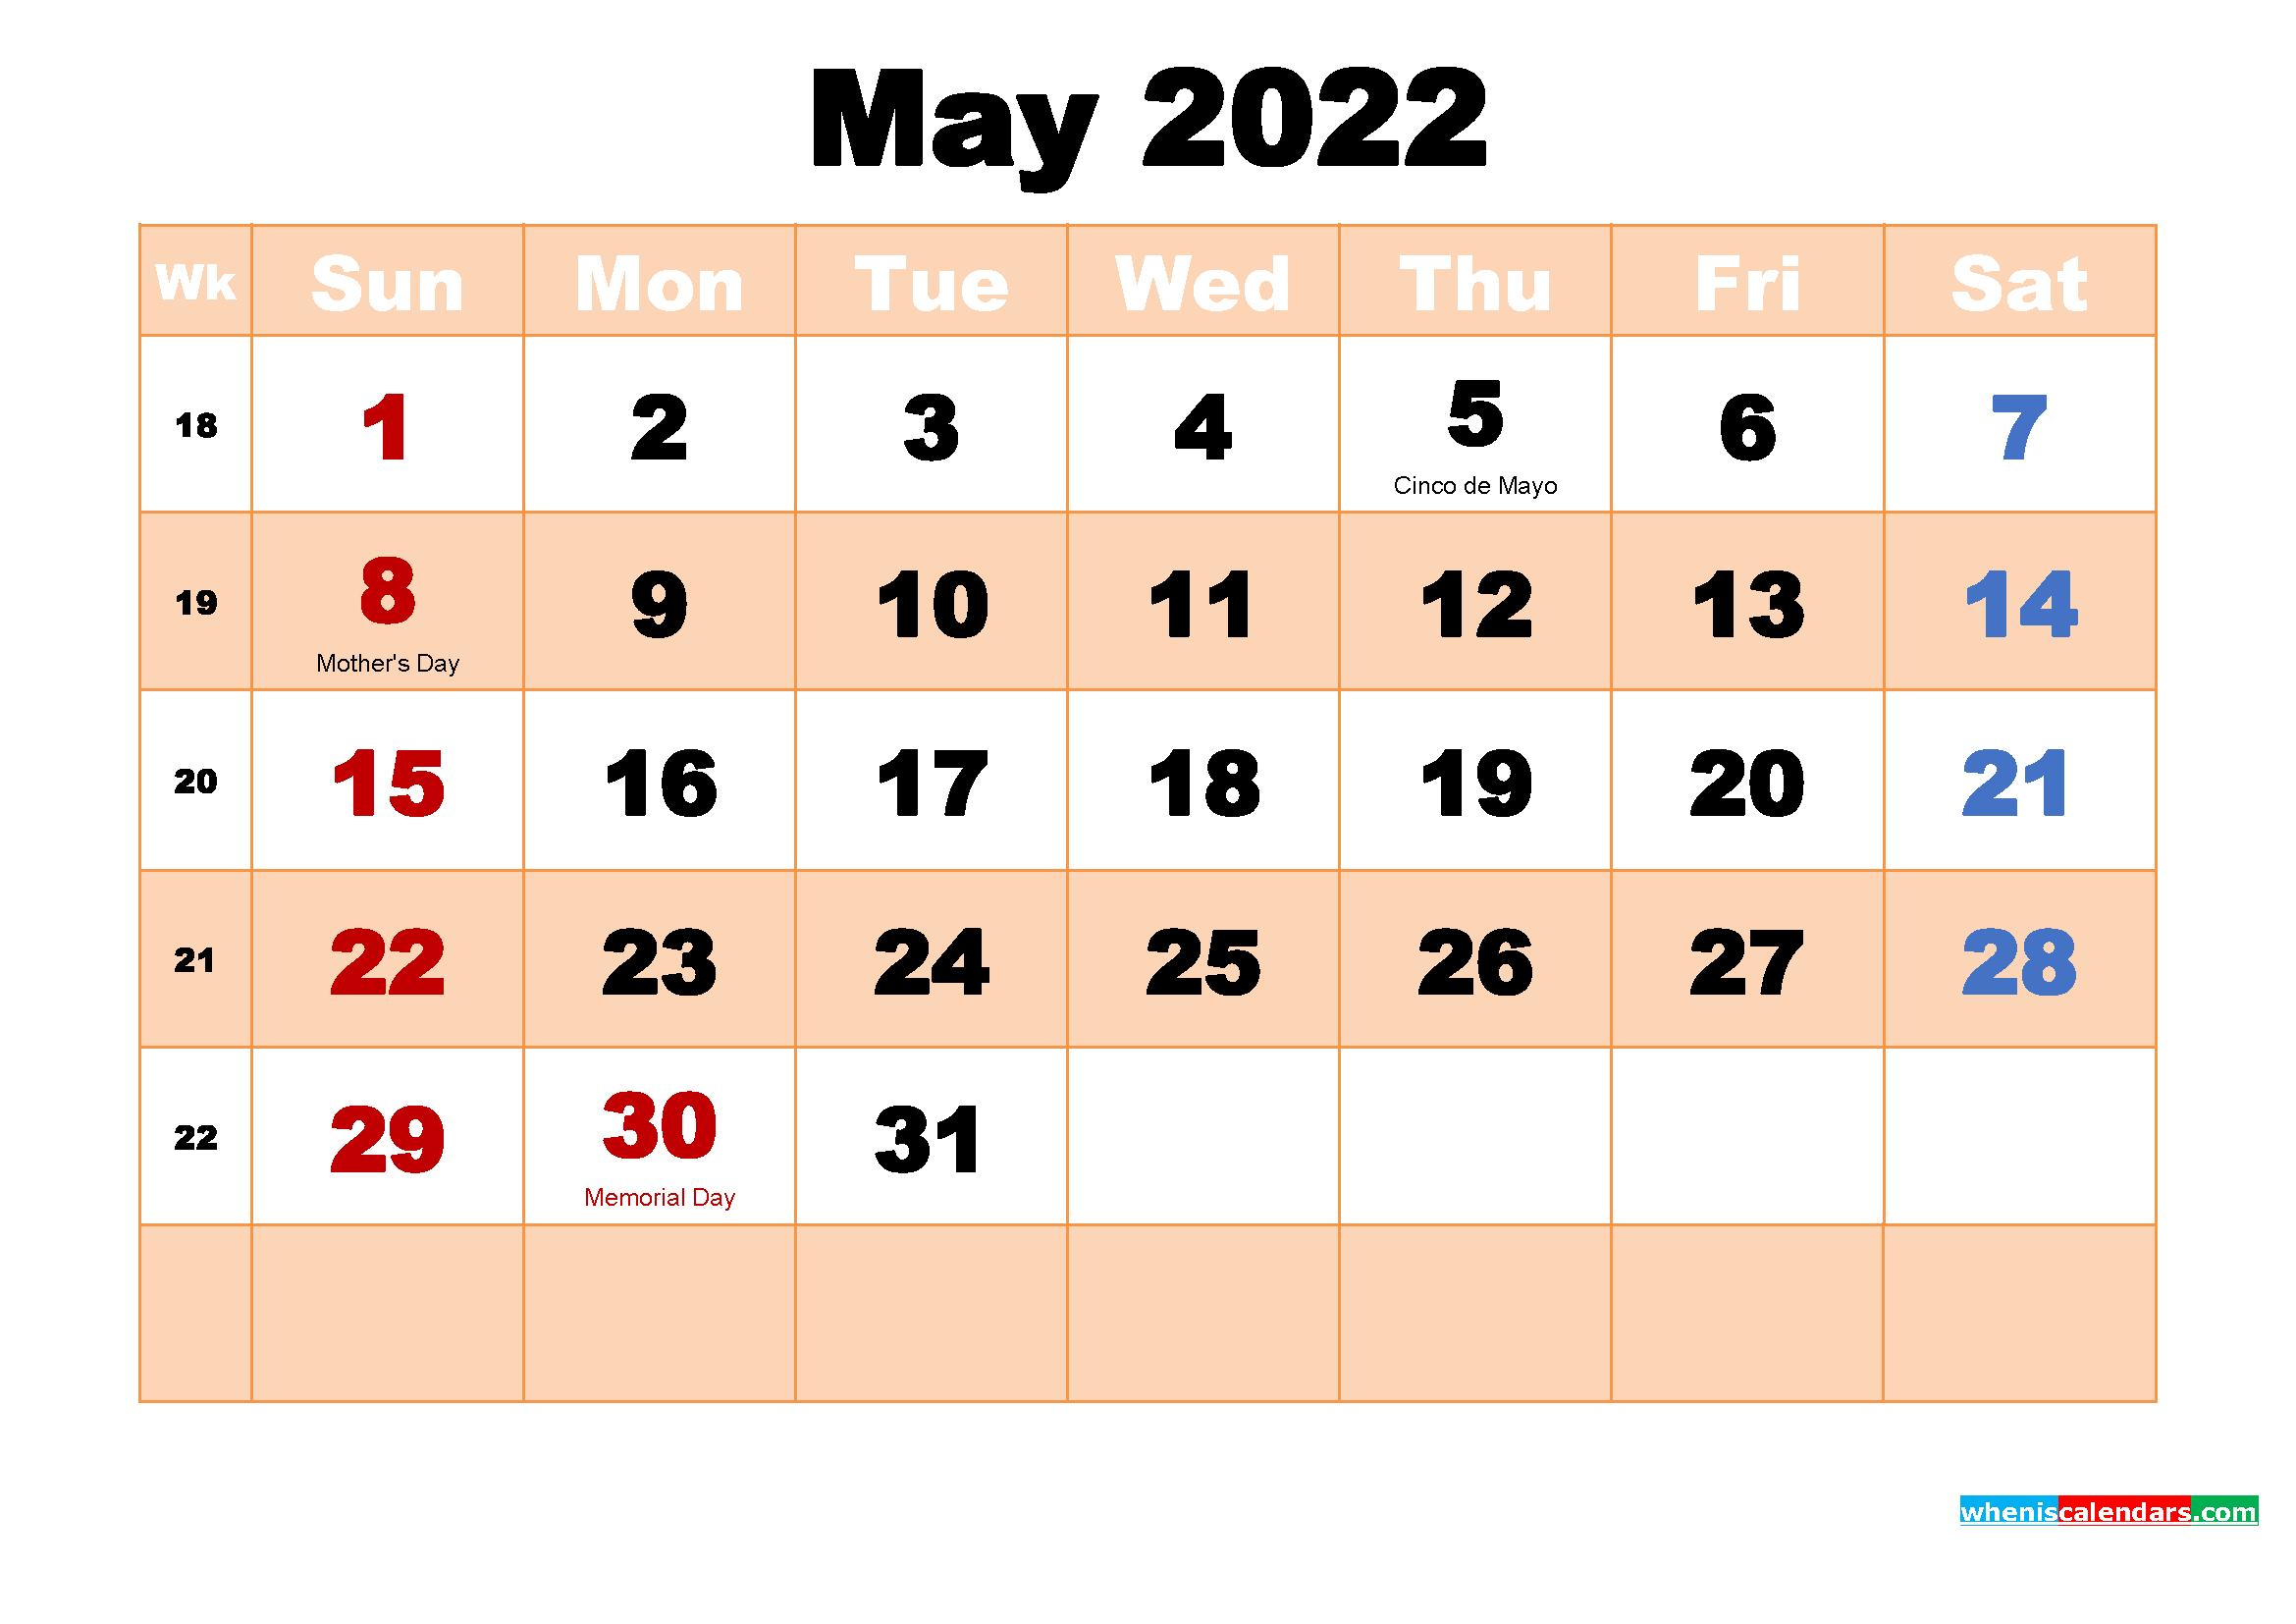 free printable 2022 calendar with holidays pdf. Free Printable May 2022 Calendar with Holidays